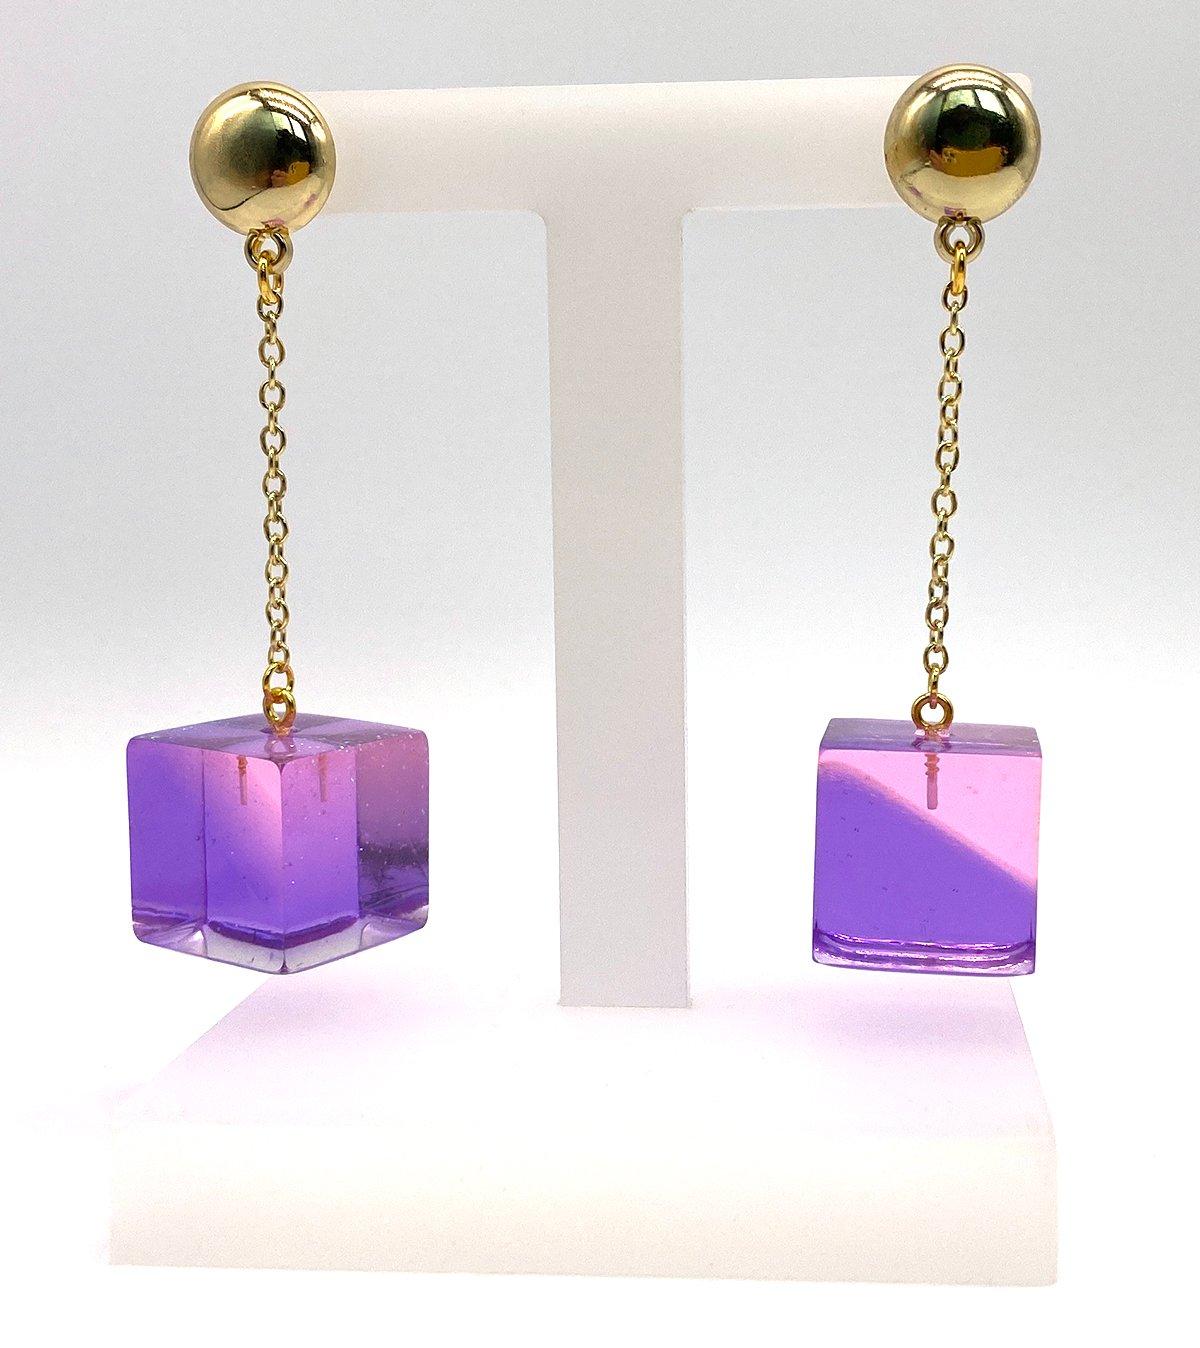 Image of Pinky Mod Cube earrings